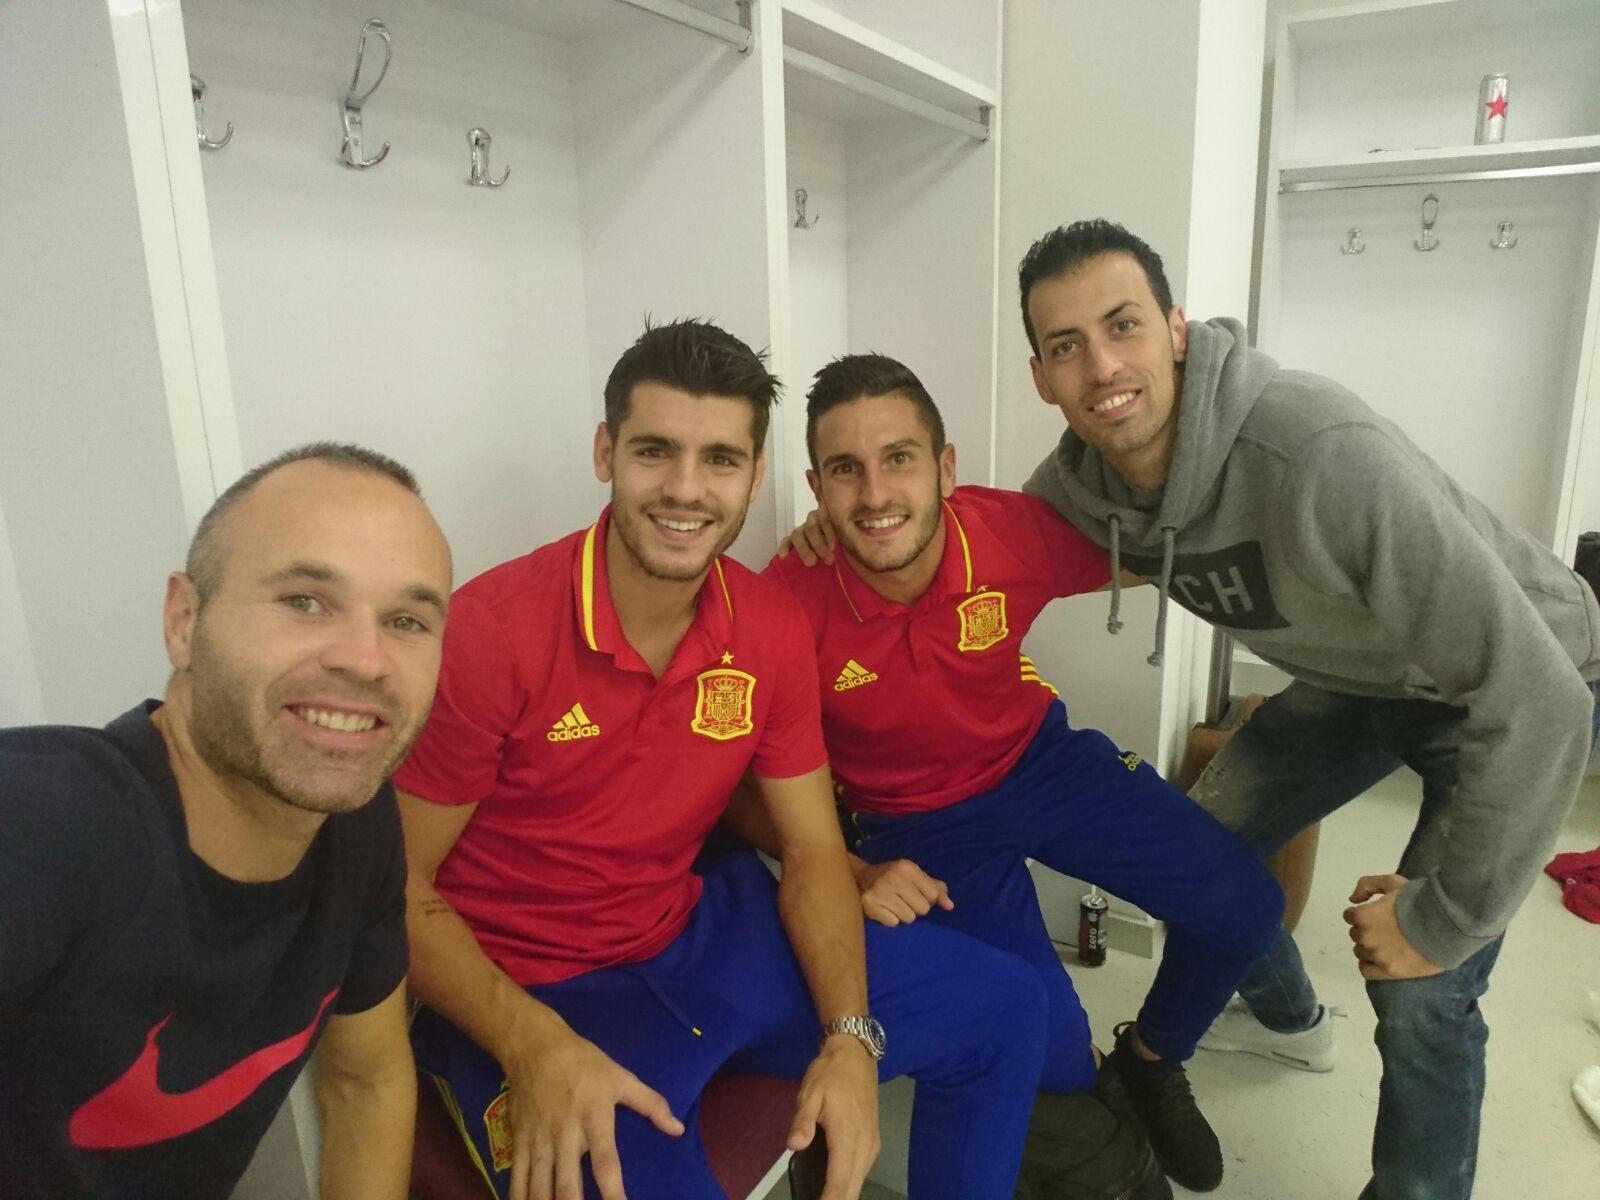 Gran victoria!!! Grande equipo! Un pasito más!! Vamos España! https://t.co/cc0q5xG4Z0